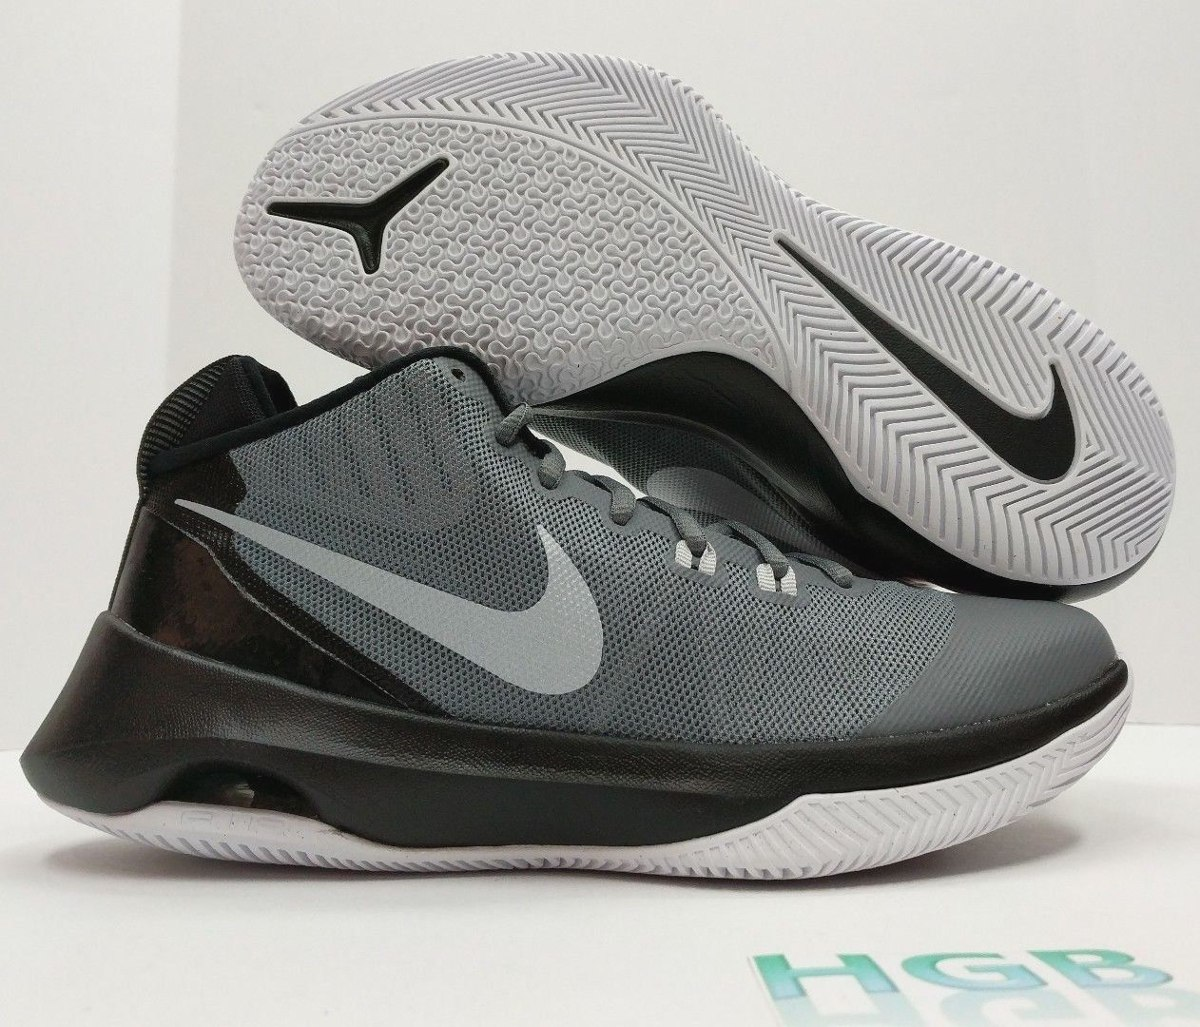 zapatillas de hombre baloncesto nike